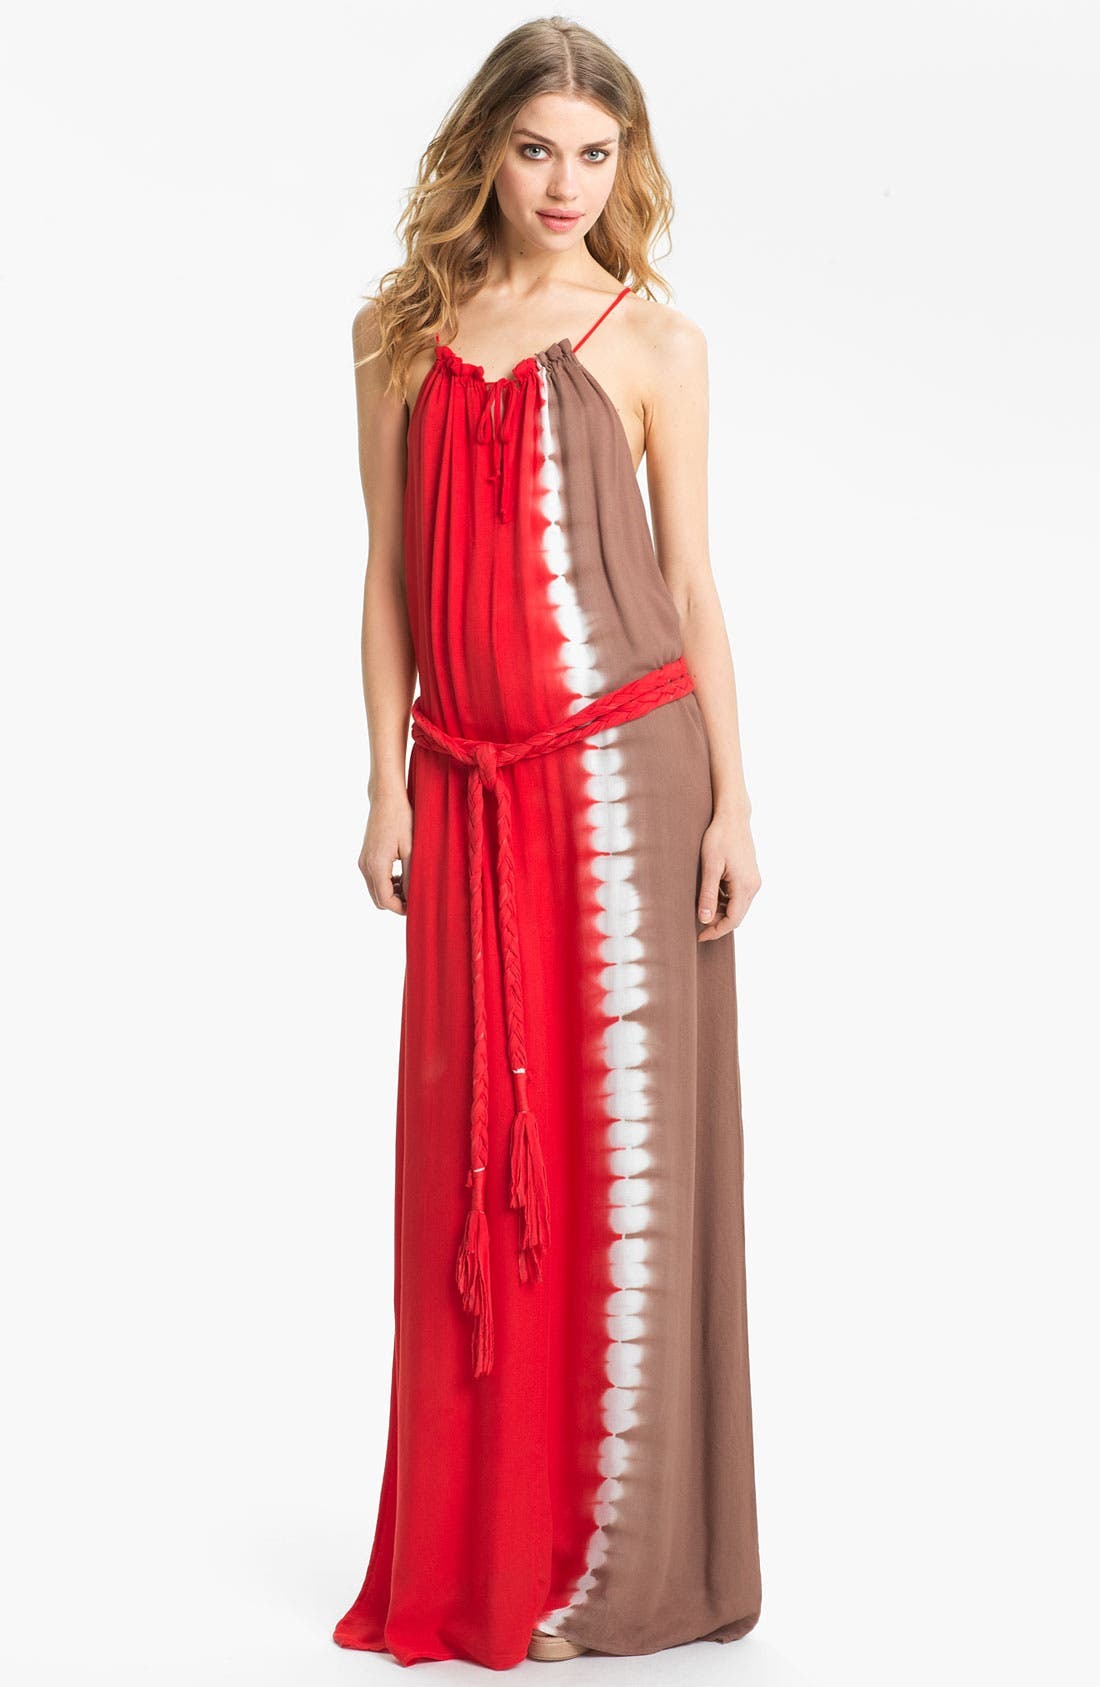 Alternate Image 1 Selected - Young, Fabulous & Broke 'Willow' Tie Dye Maxi Dress